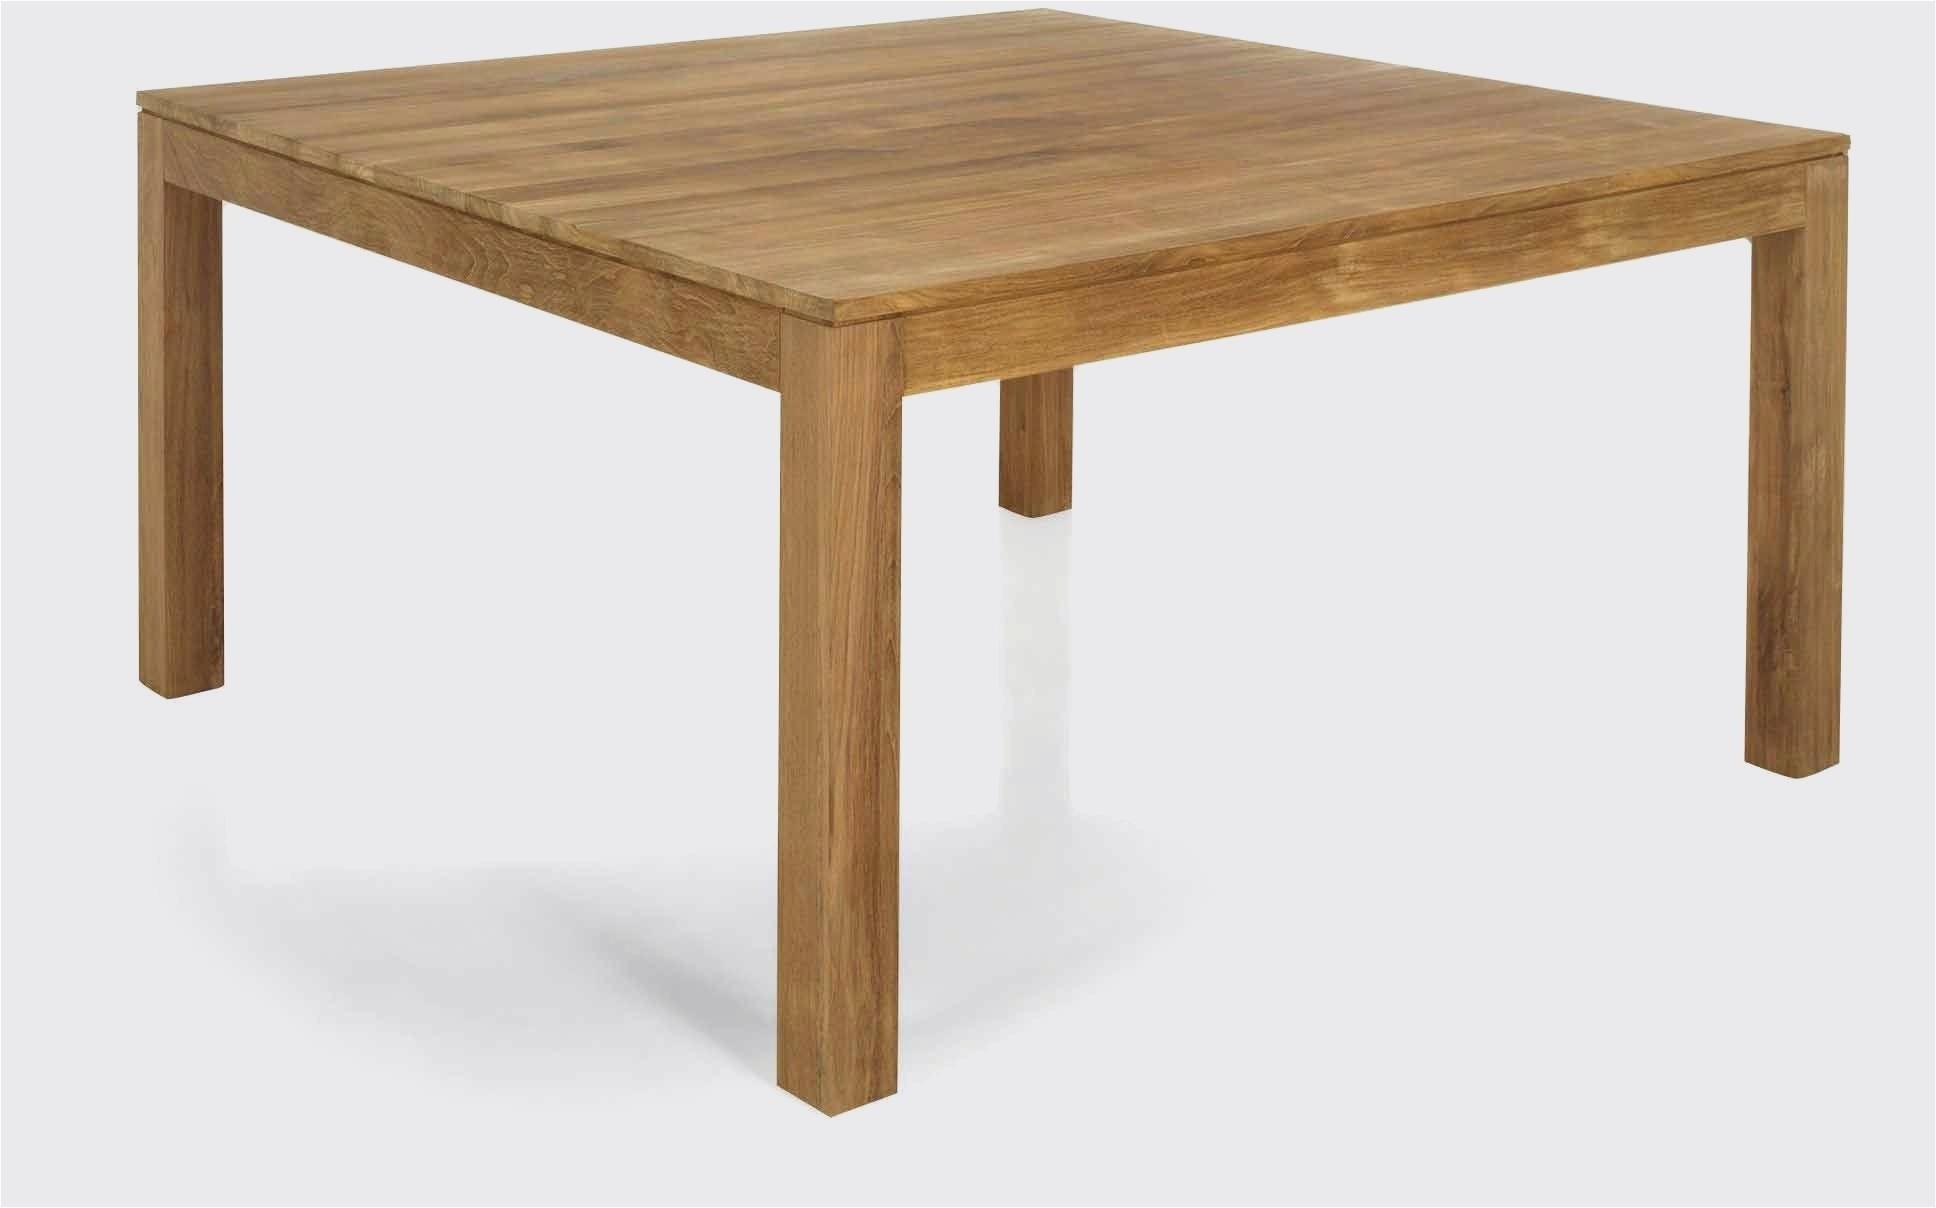 Table Salon Conforama Beau Galerie Table Basse Transformable Conforama Nouveau Table Basse Conforama